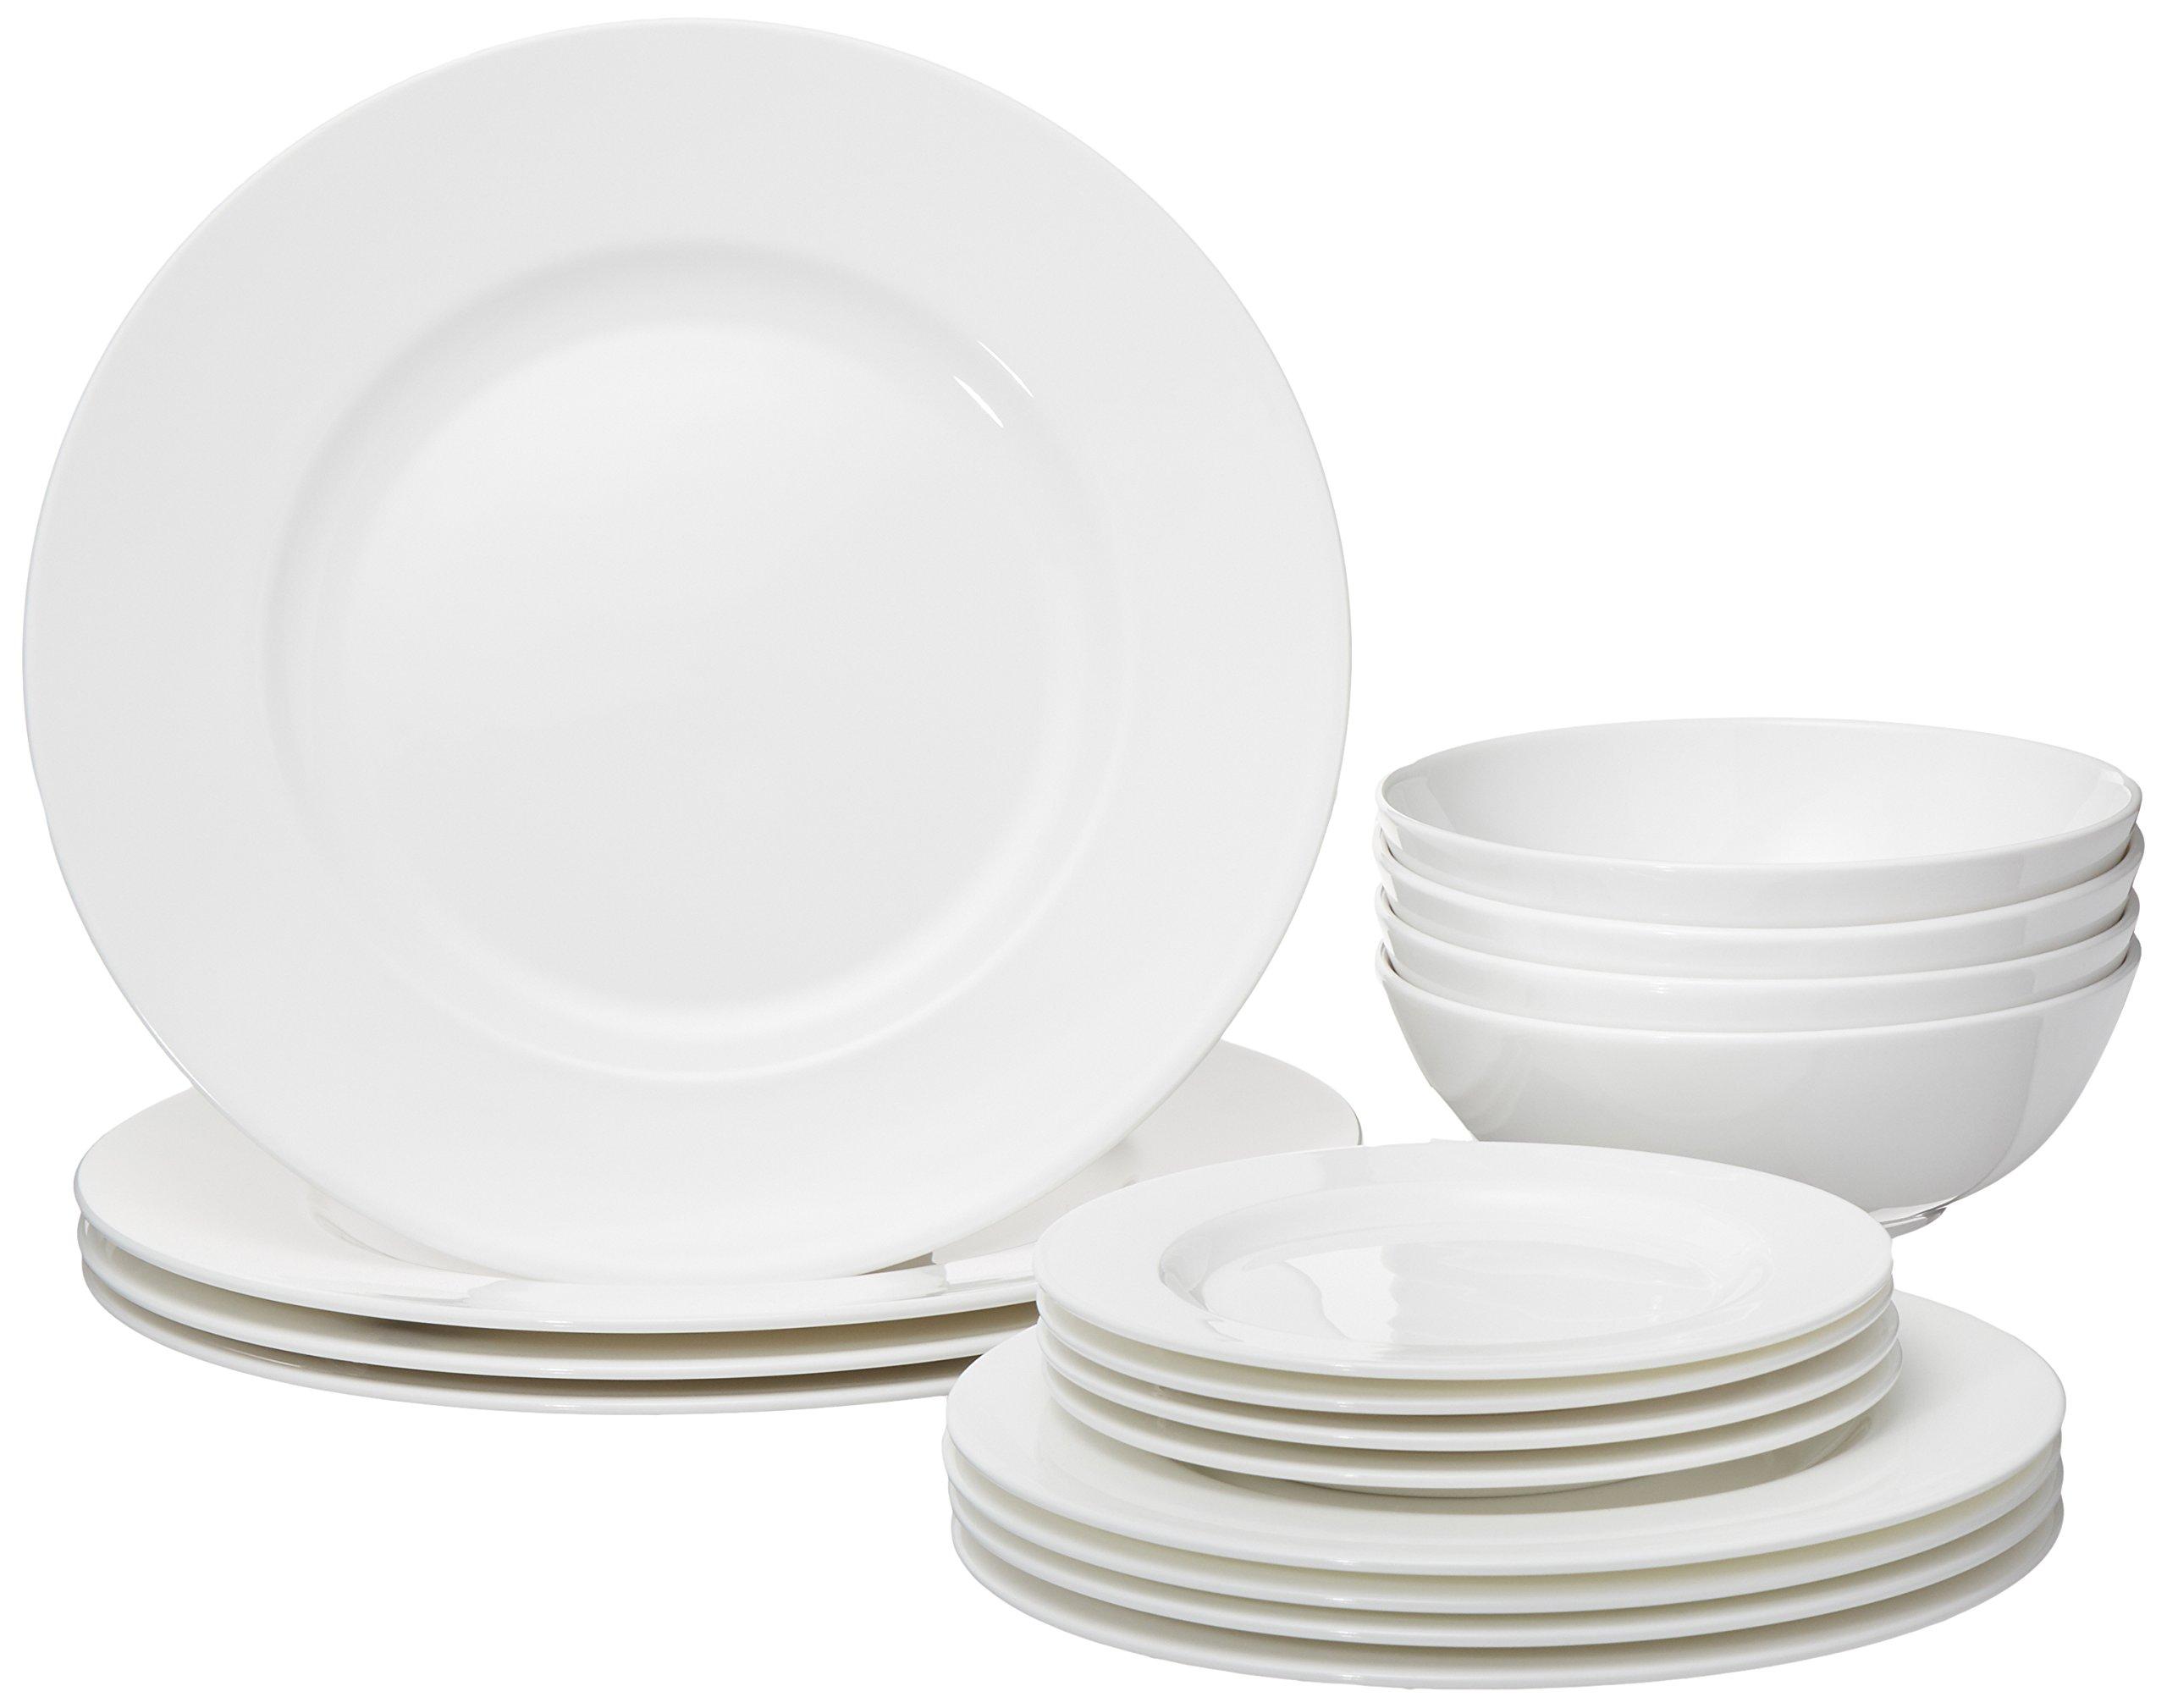 Lenox 16 Piece Classic White Dinnerware Set